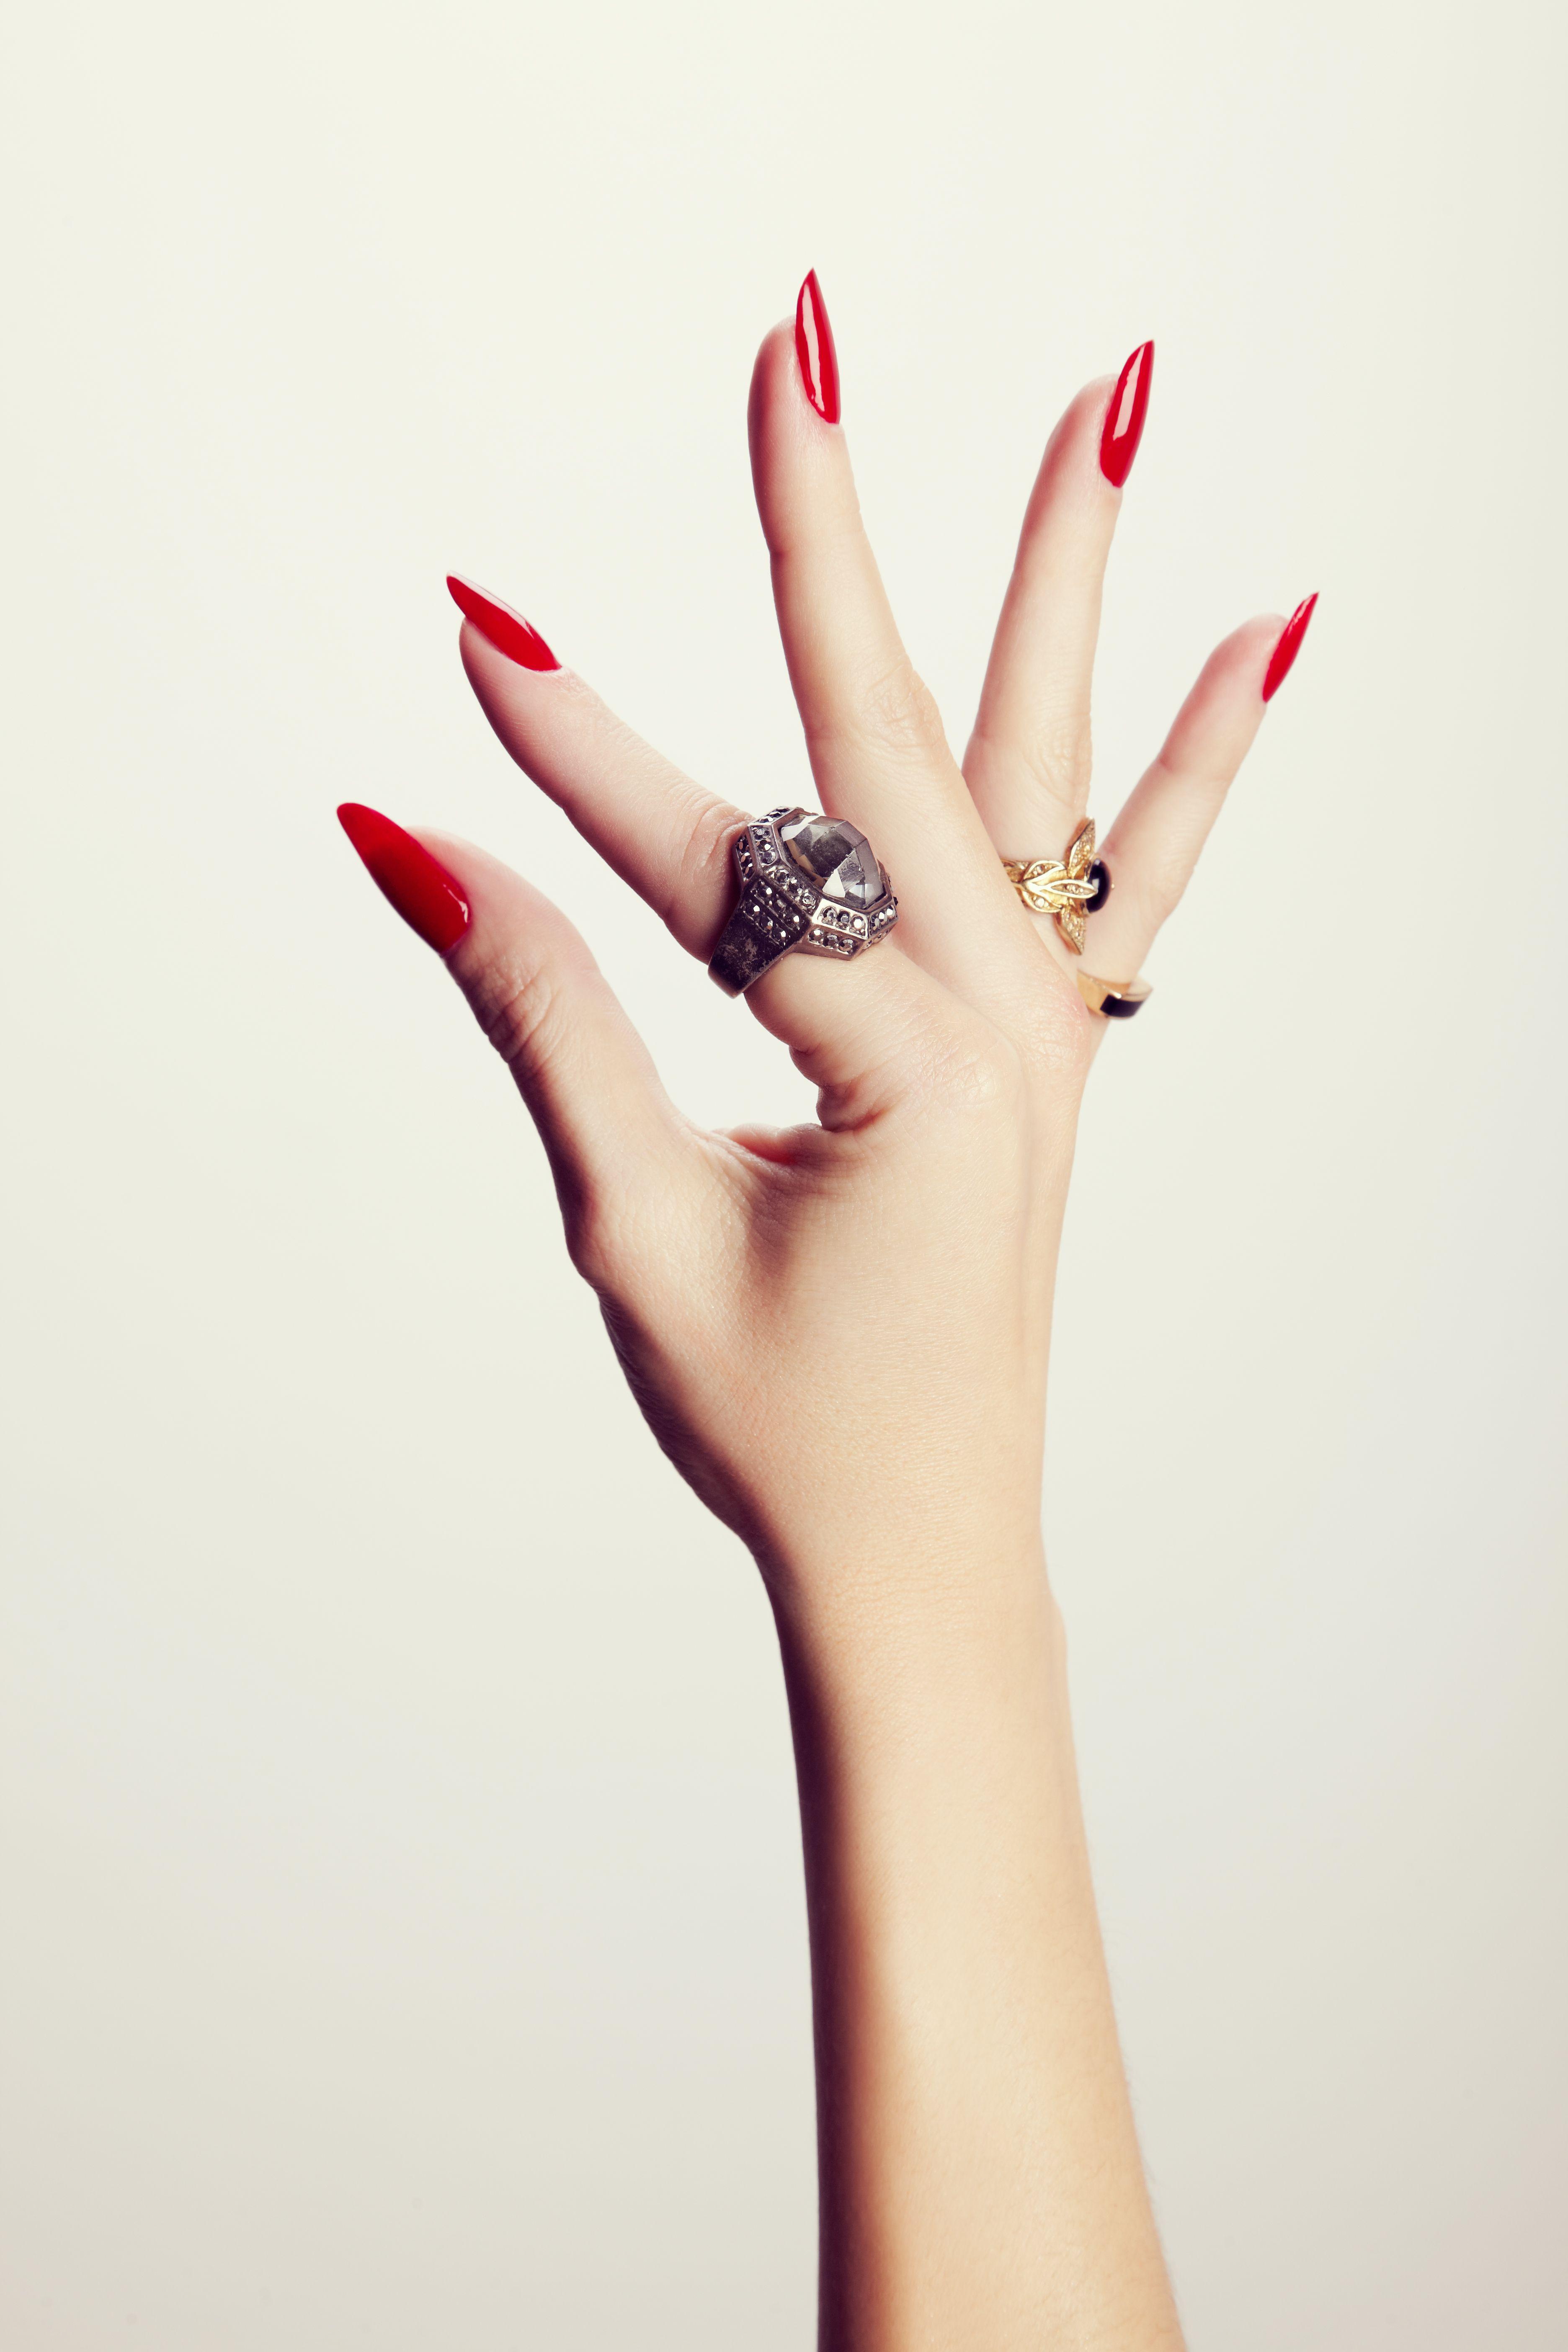 Hand Model Ashley Frey Natural Nails Cushnie Et Ochs Nail Art